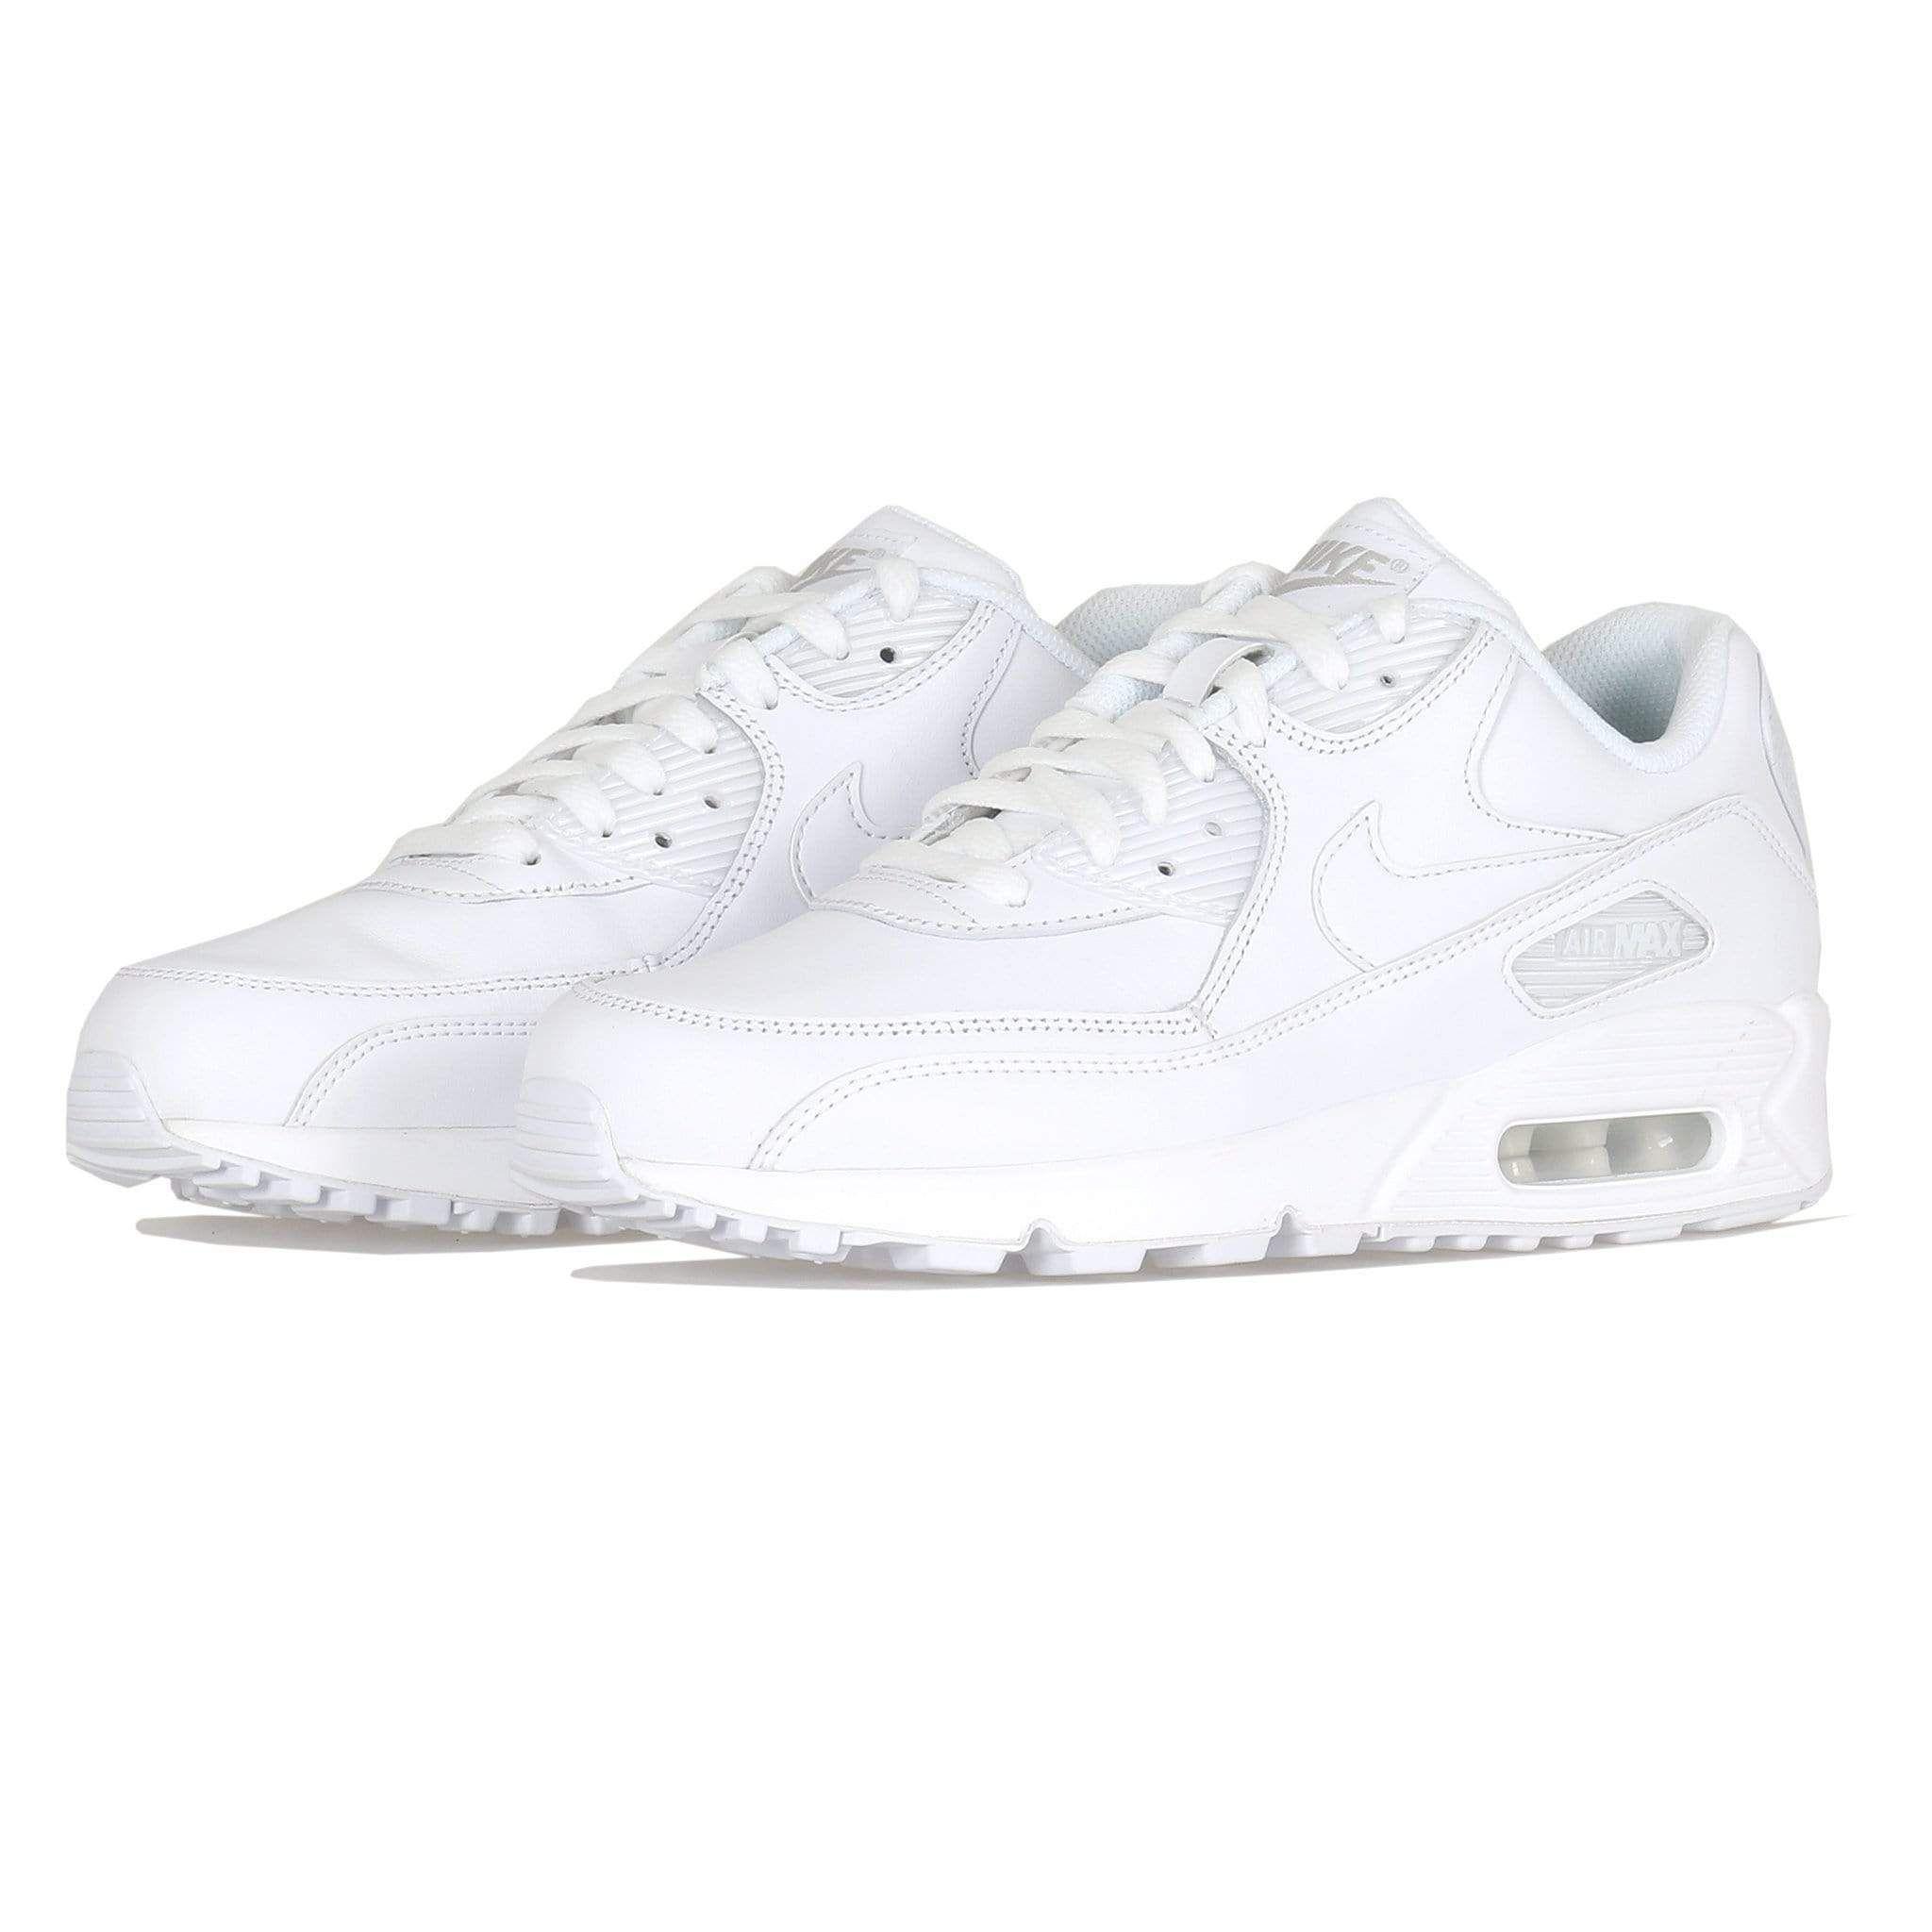 Nike Air Max 90 Leather Triple White UK 8.5   Air max 90